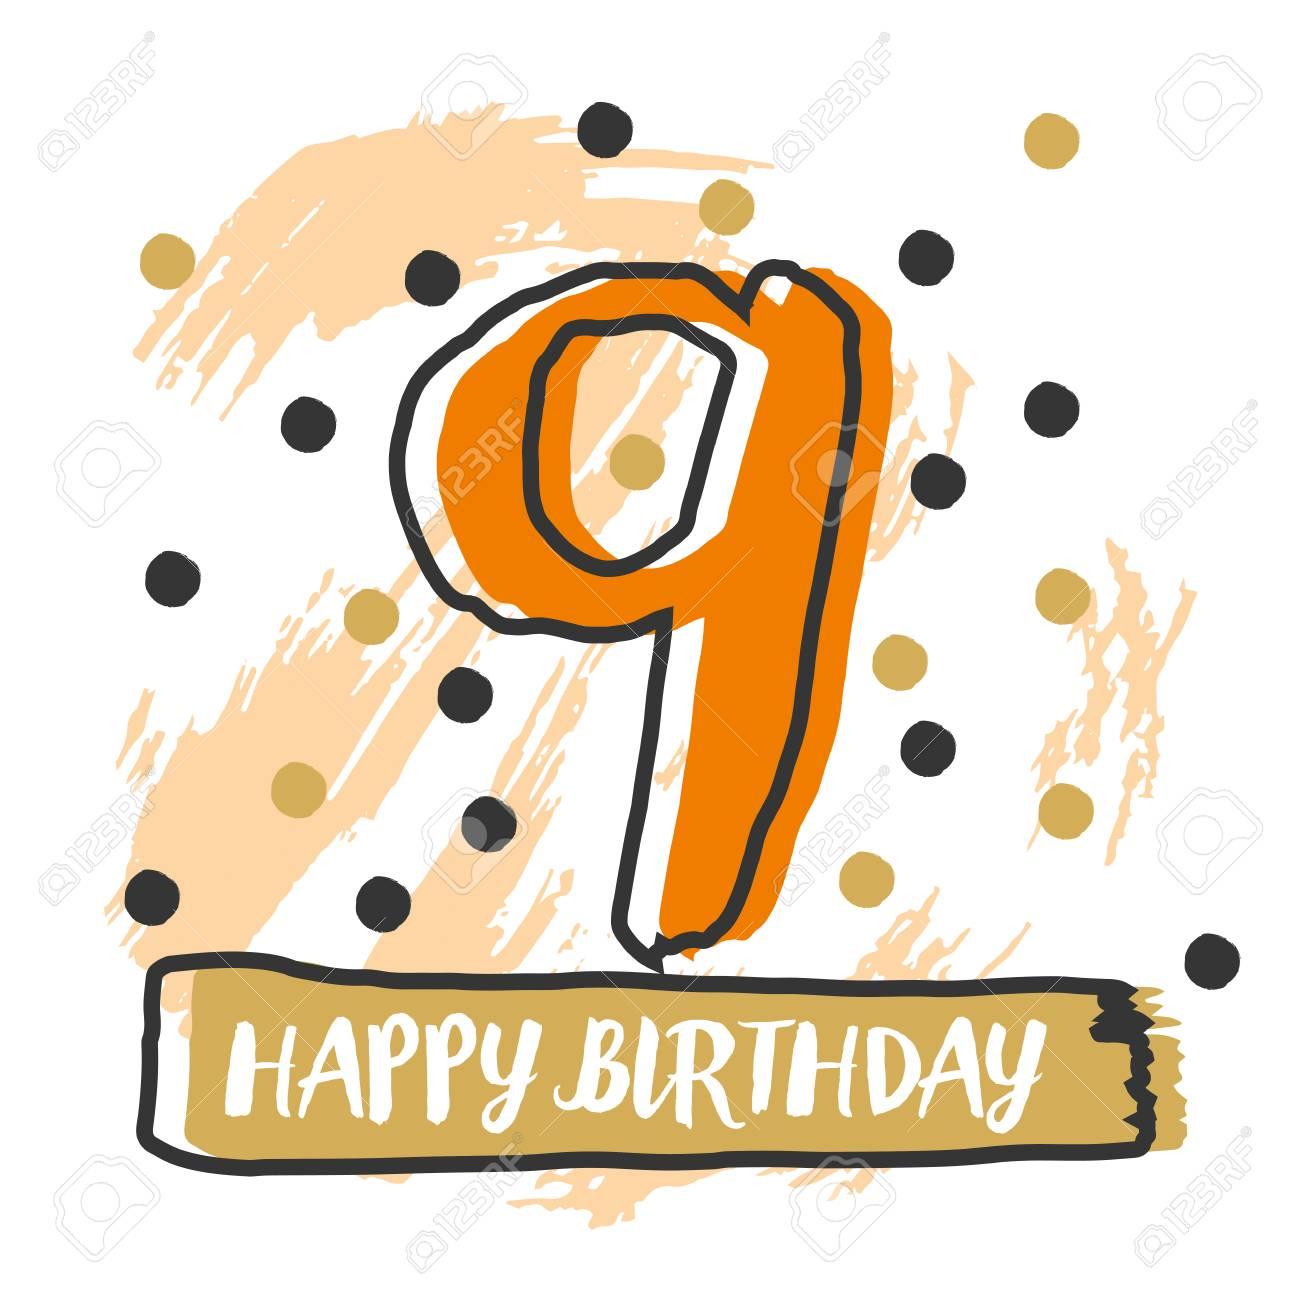 happy 9th birthday vector illustration royalty free cliparts